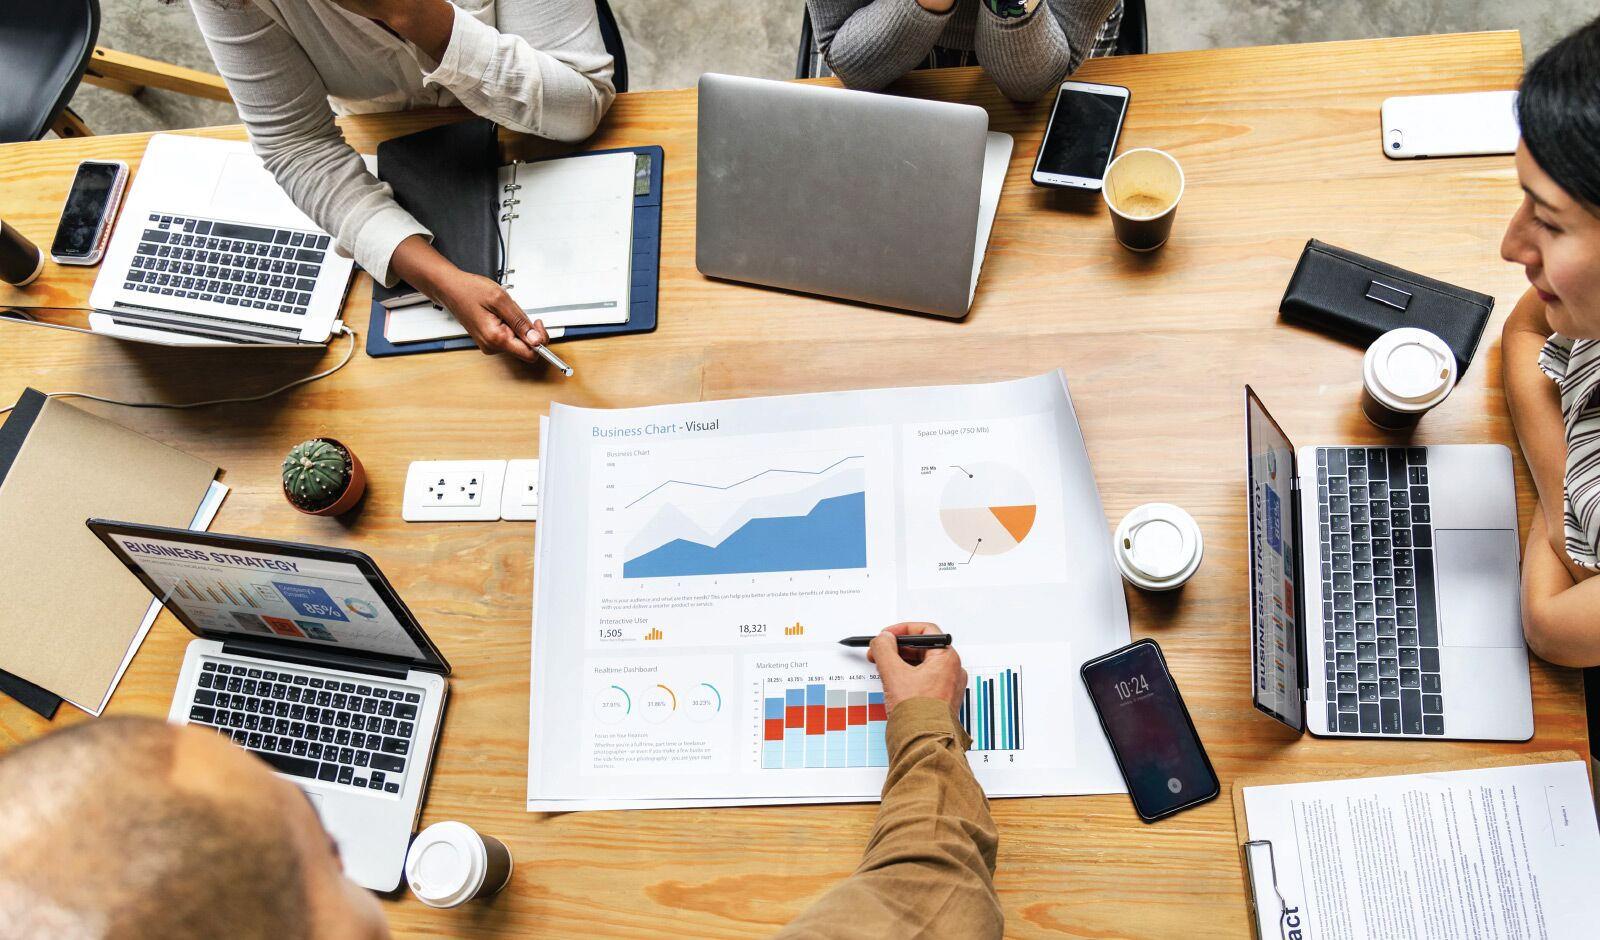 Анализ текущего бизнес-процесса